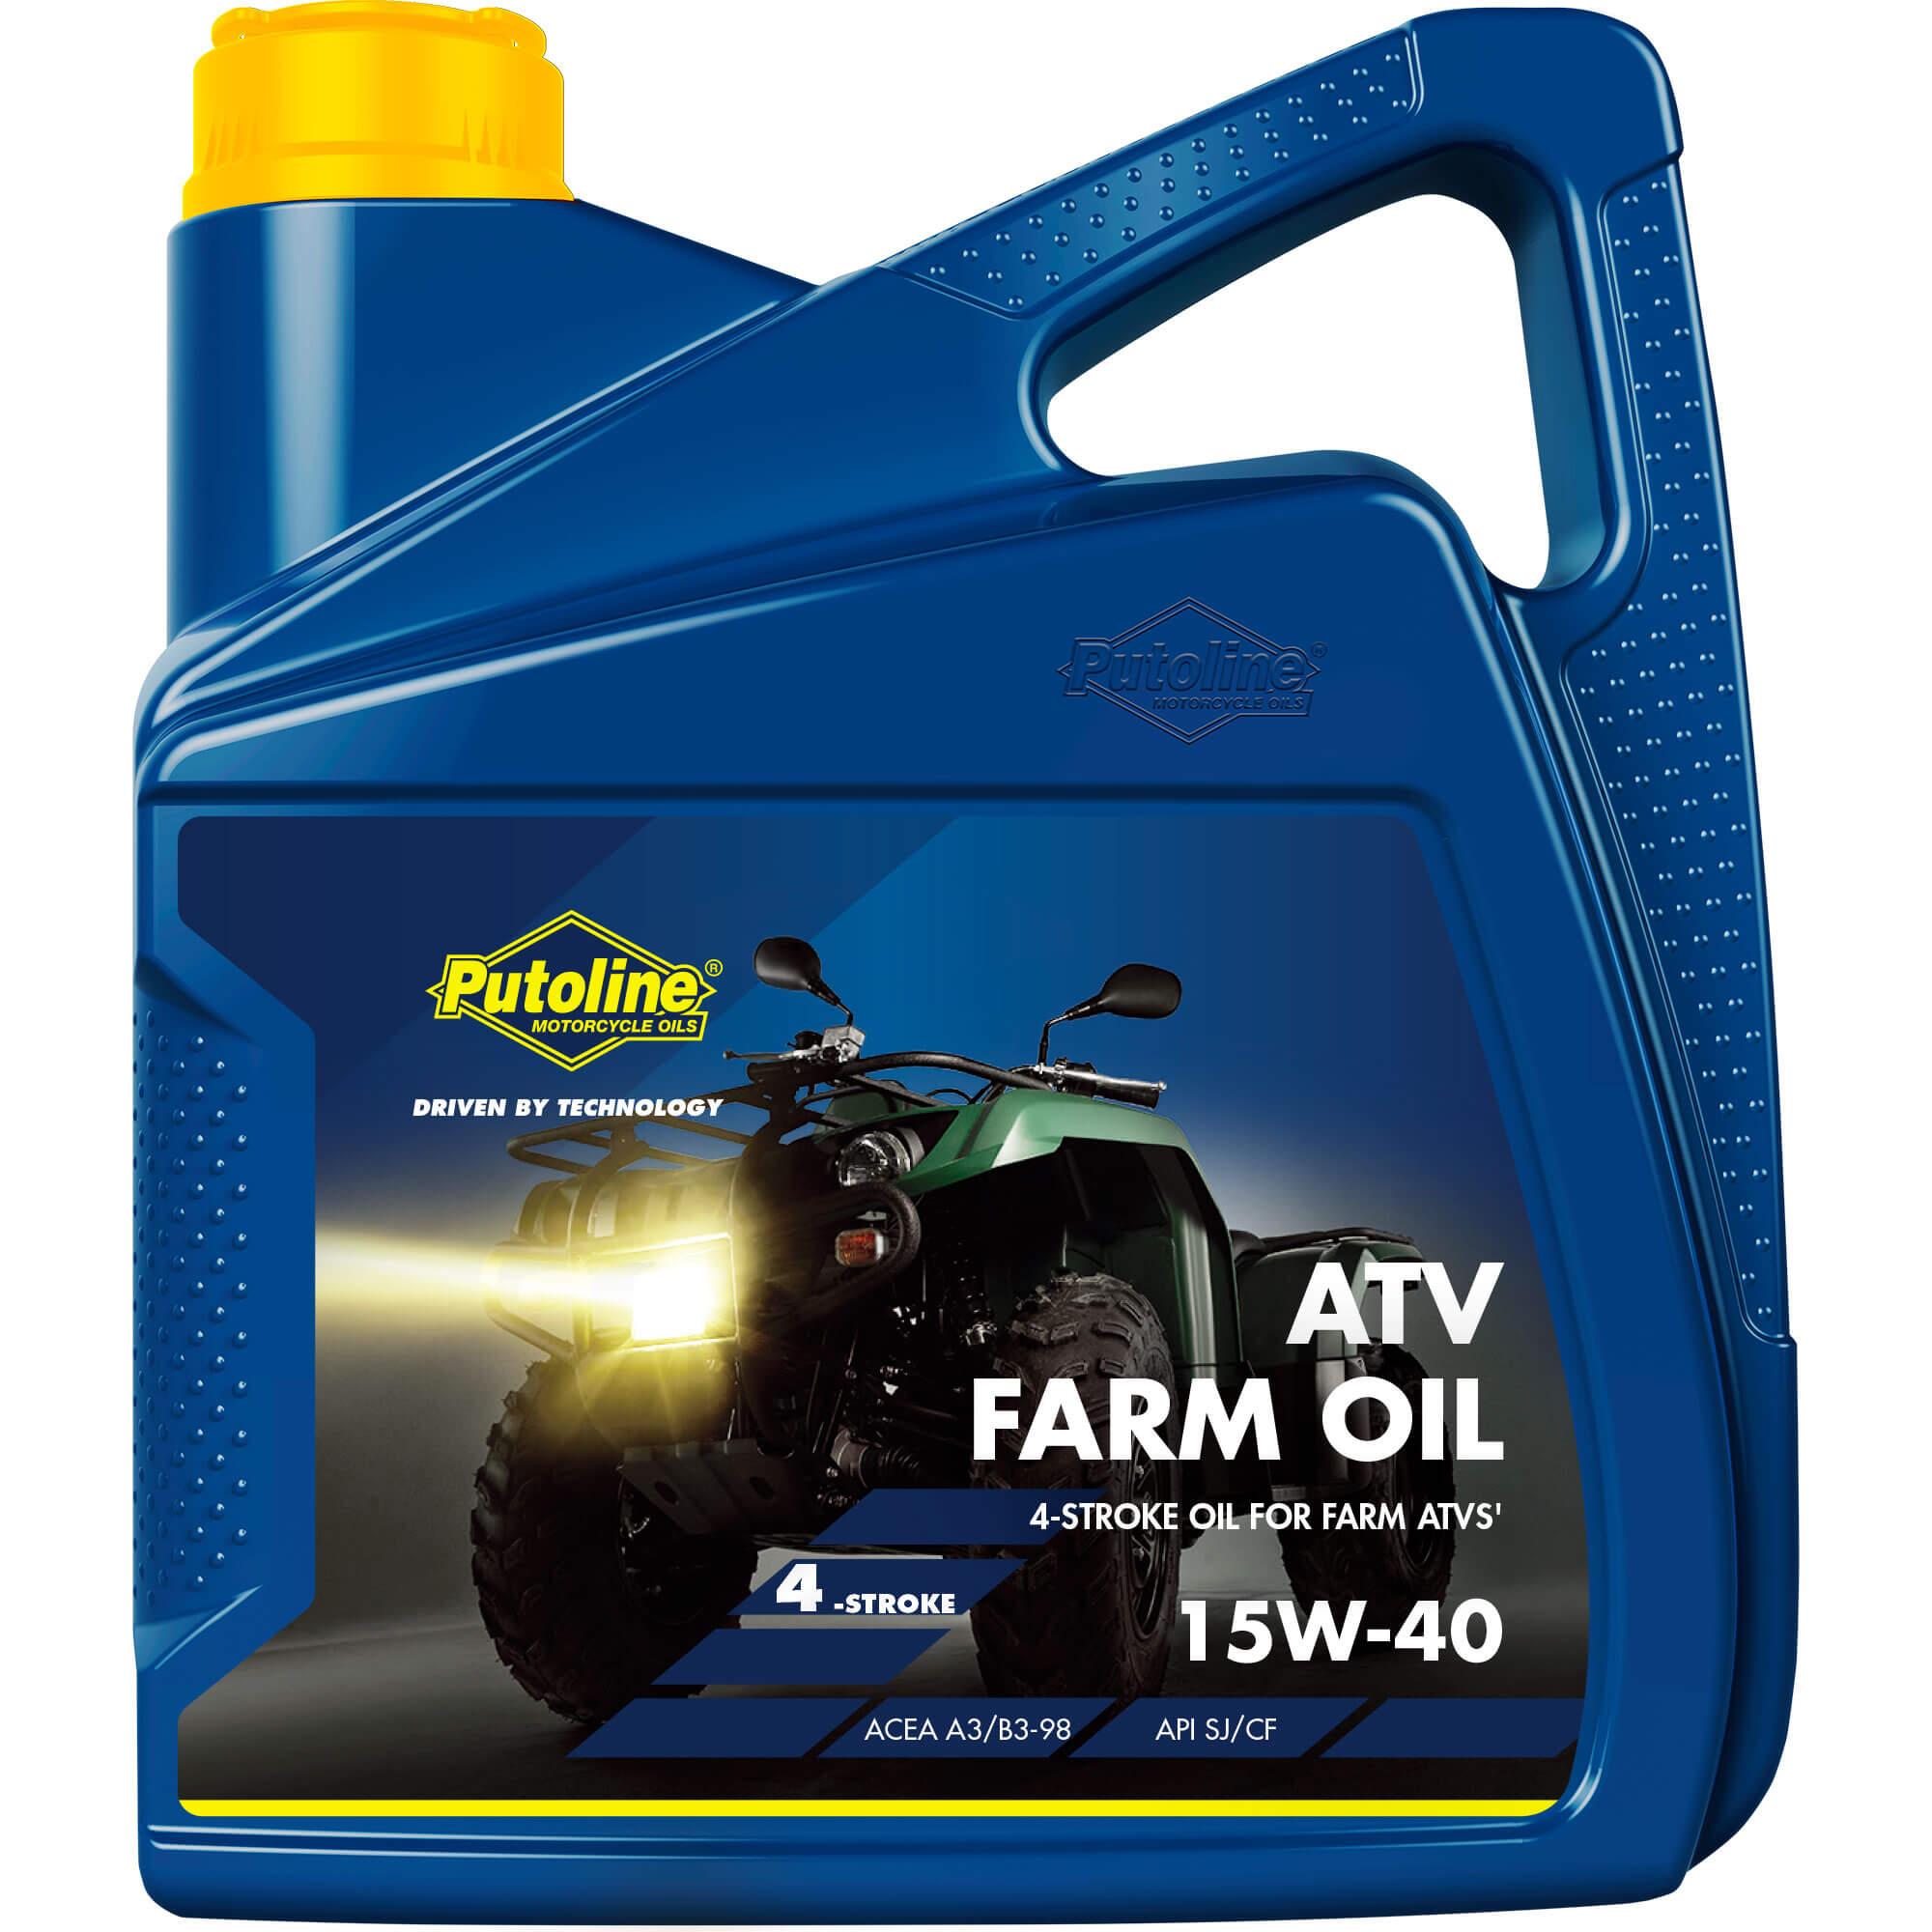 4L H. moteur 4 Tps 15W-40 Putoline ATV Farm Oil